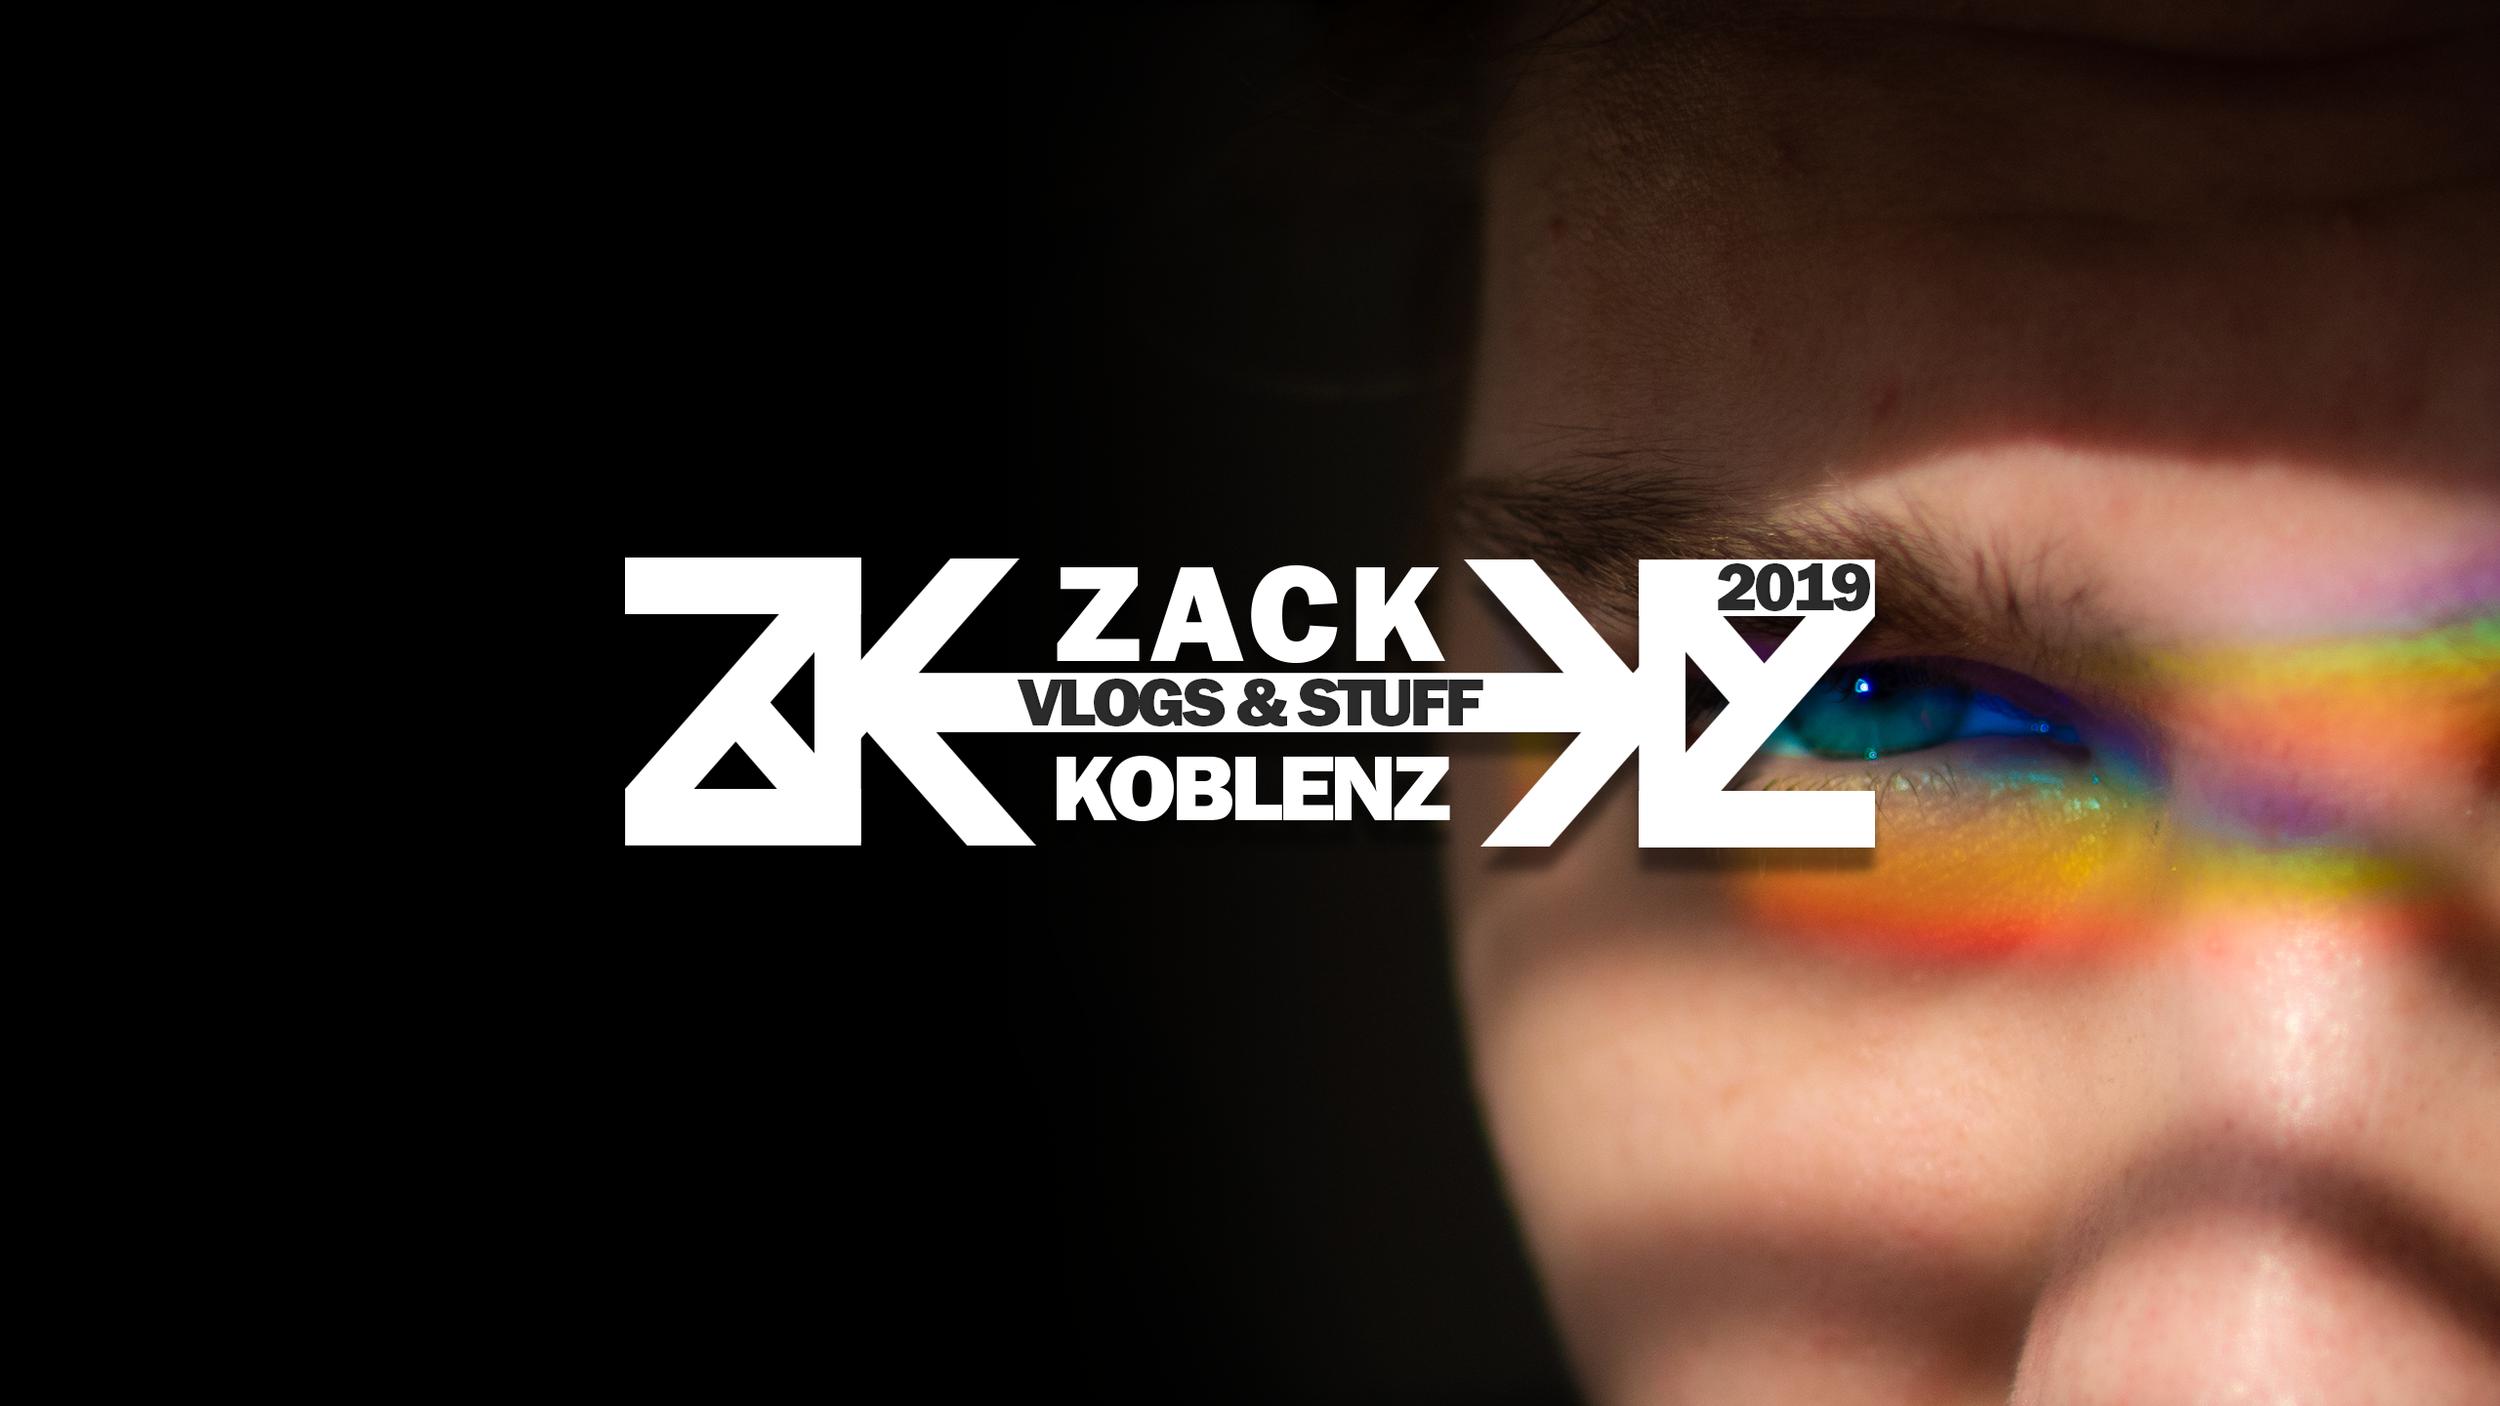 Zack Koblenz Vlogs and Stuff 2019 Background 2.png